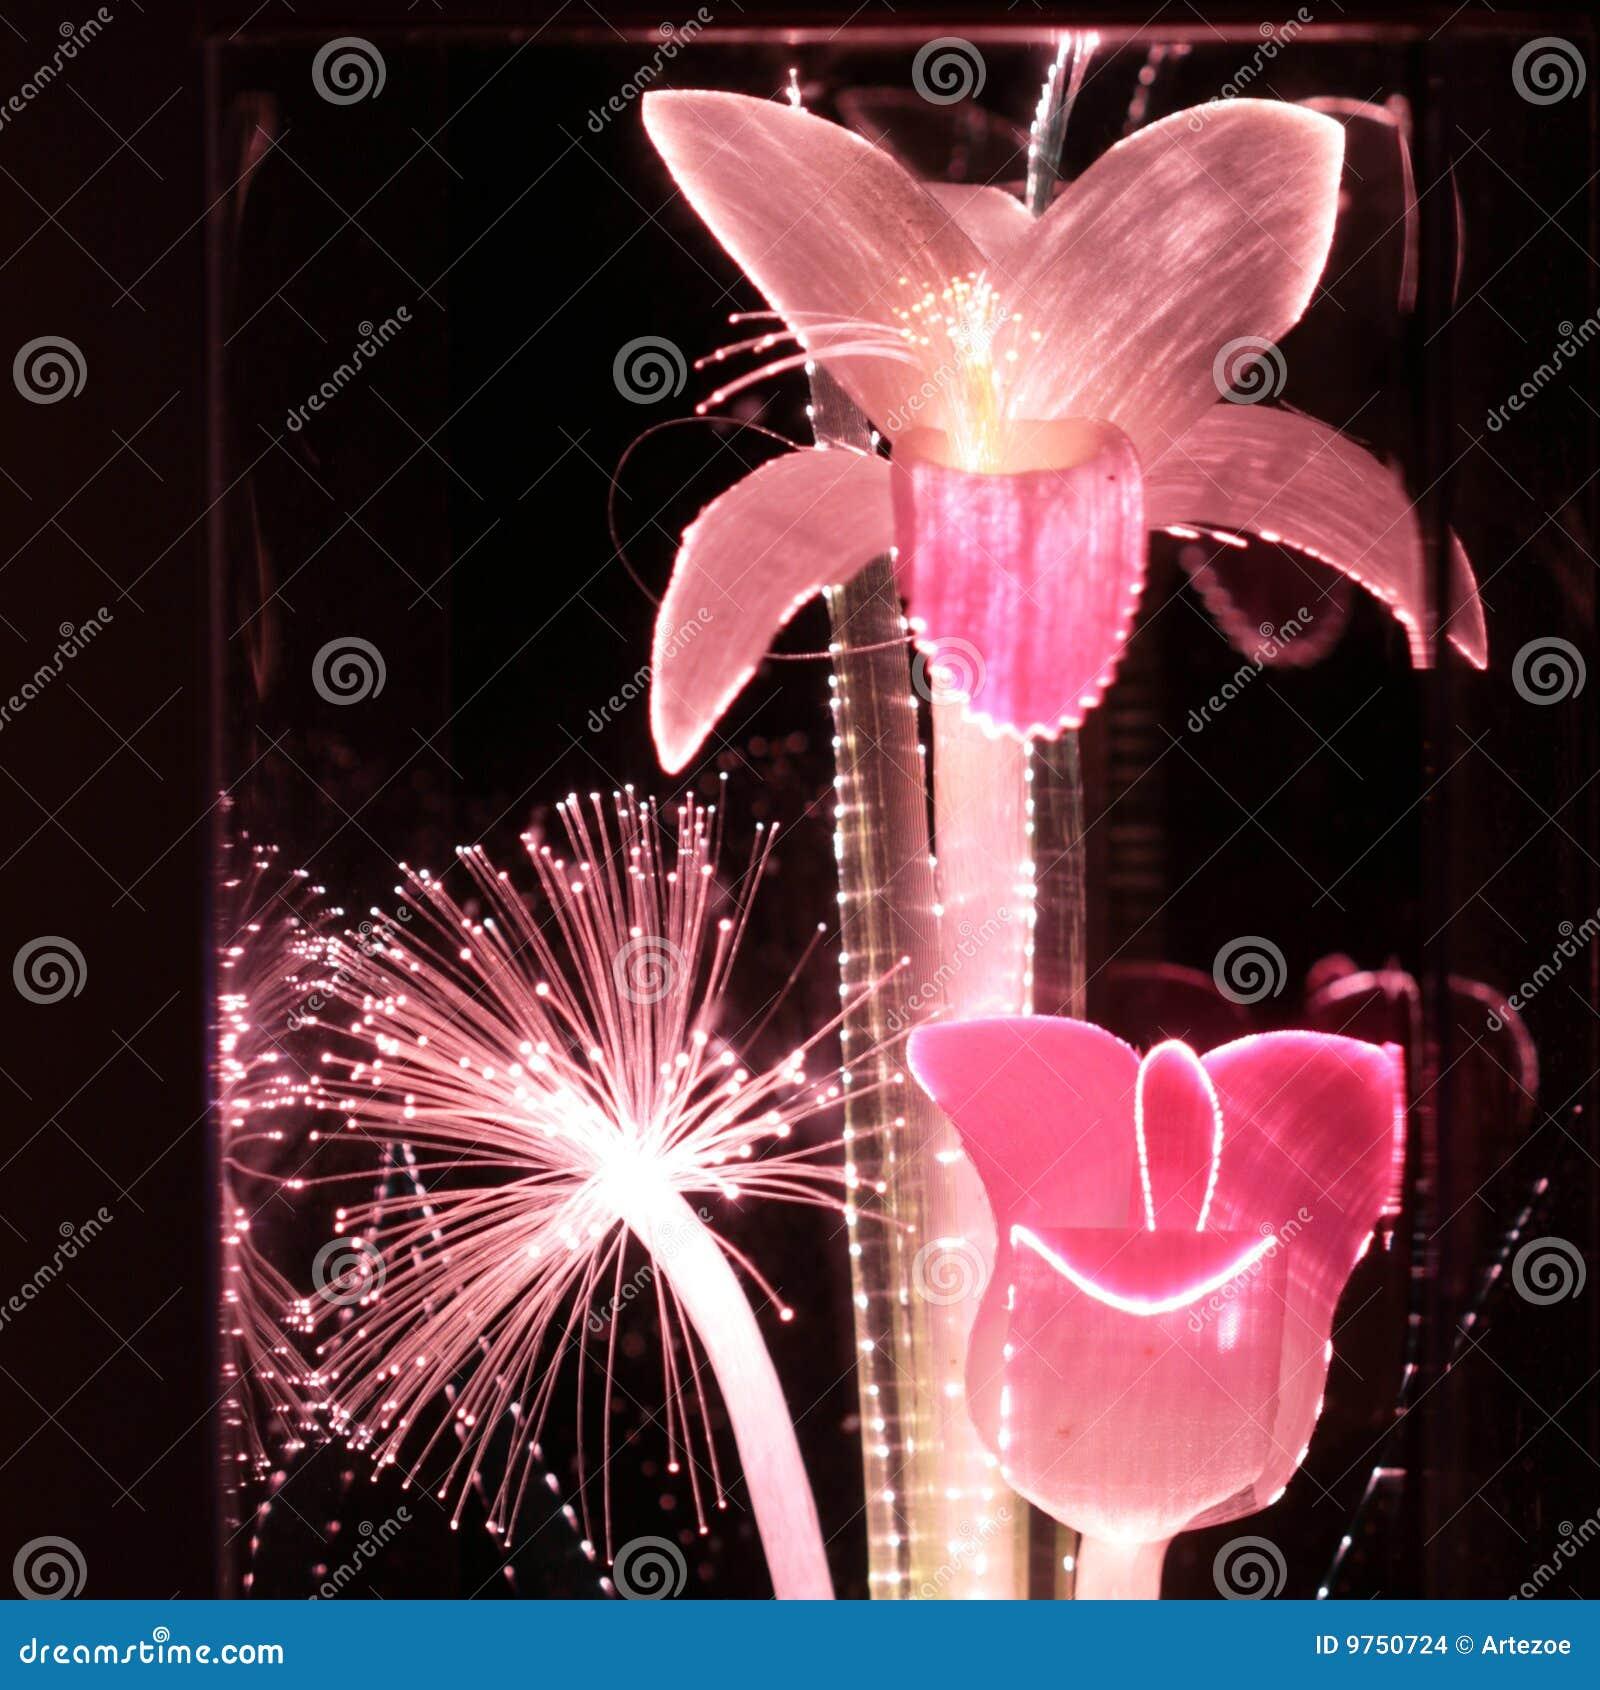 Pink Fiber Optic Flowers Stock Photo Image Of Bright